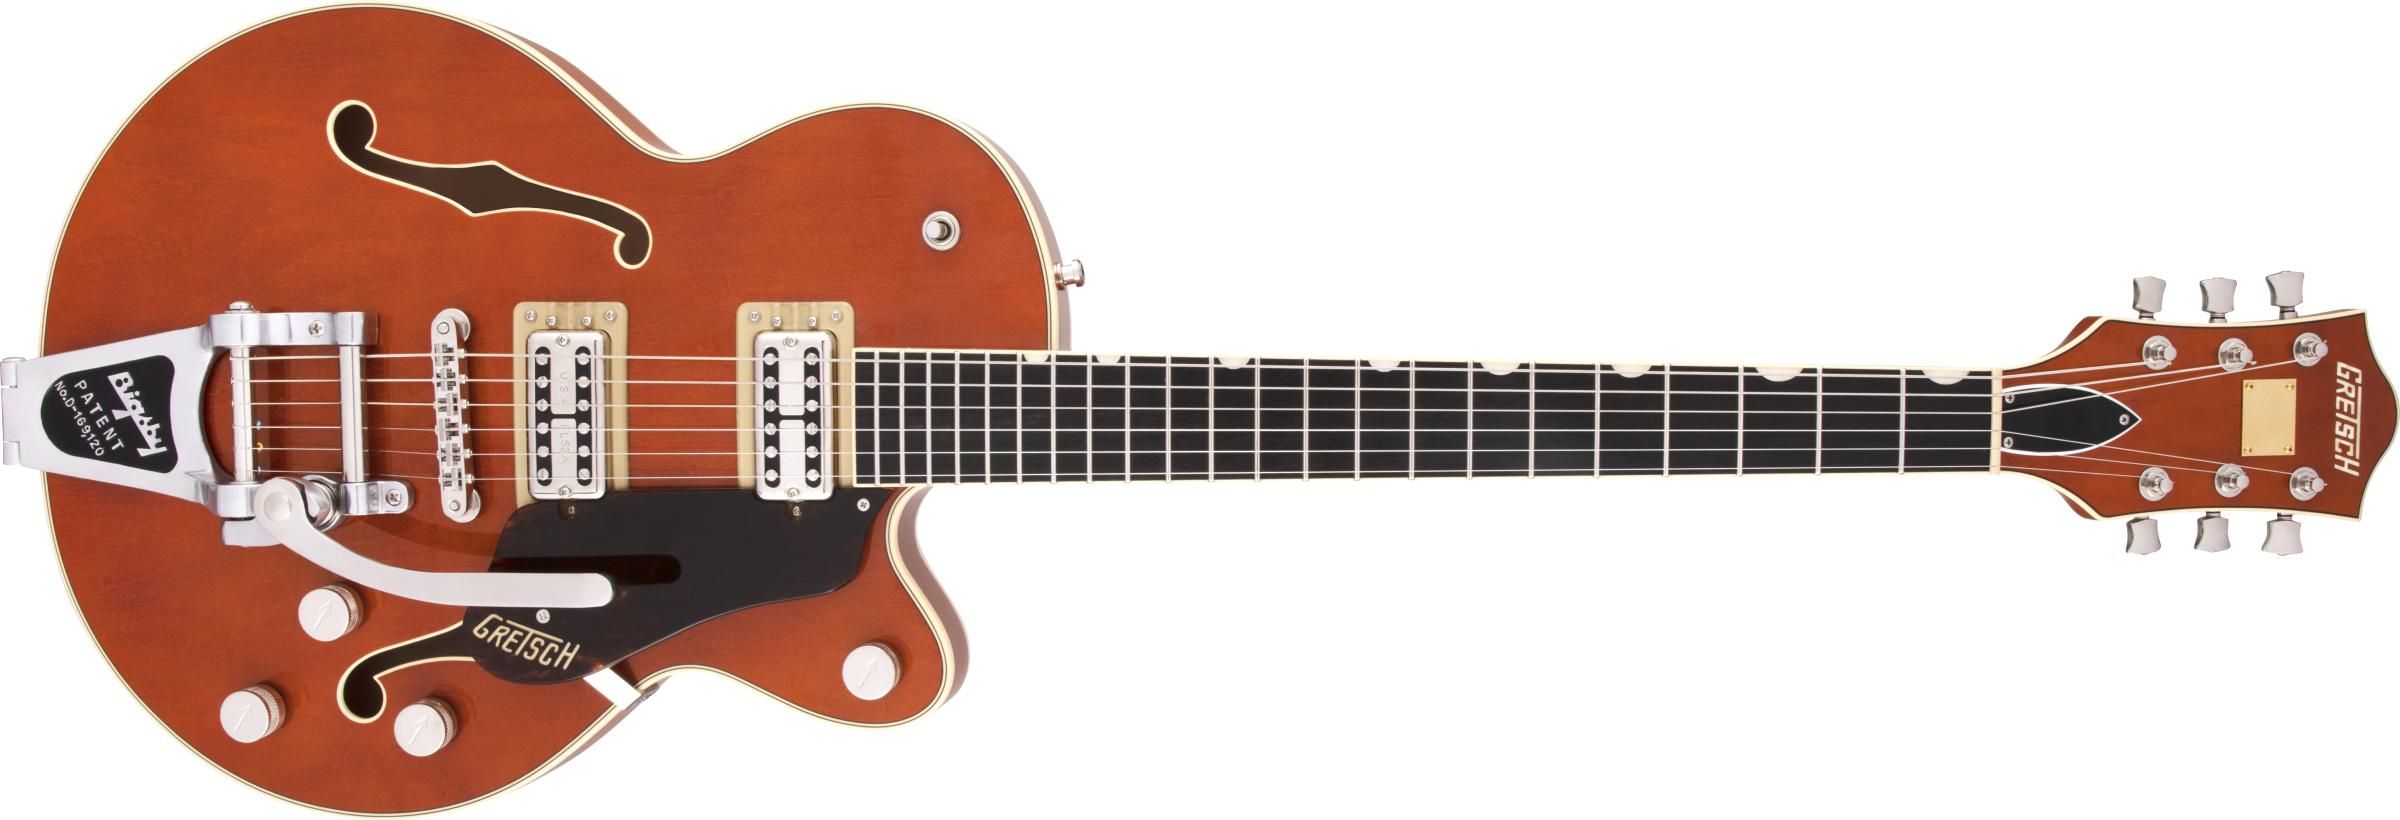 GRETSCH-G6659T-Players-Edition-Broadkaster-Jr-Center-Block-Single-Cut-with-String-Thru-Bigsby-USA-FullTron-Pickups-Ebony-Fingerboard-Roundup-Orange-sku-571004814